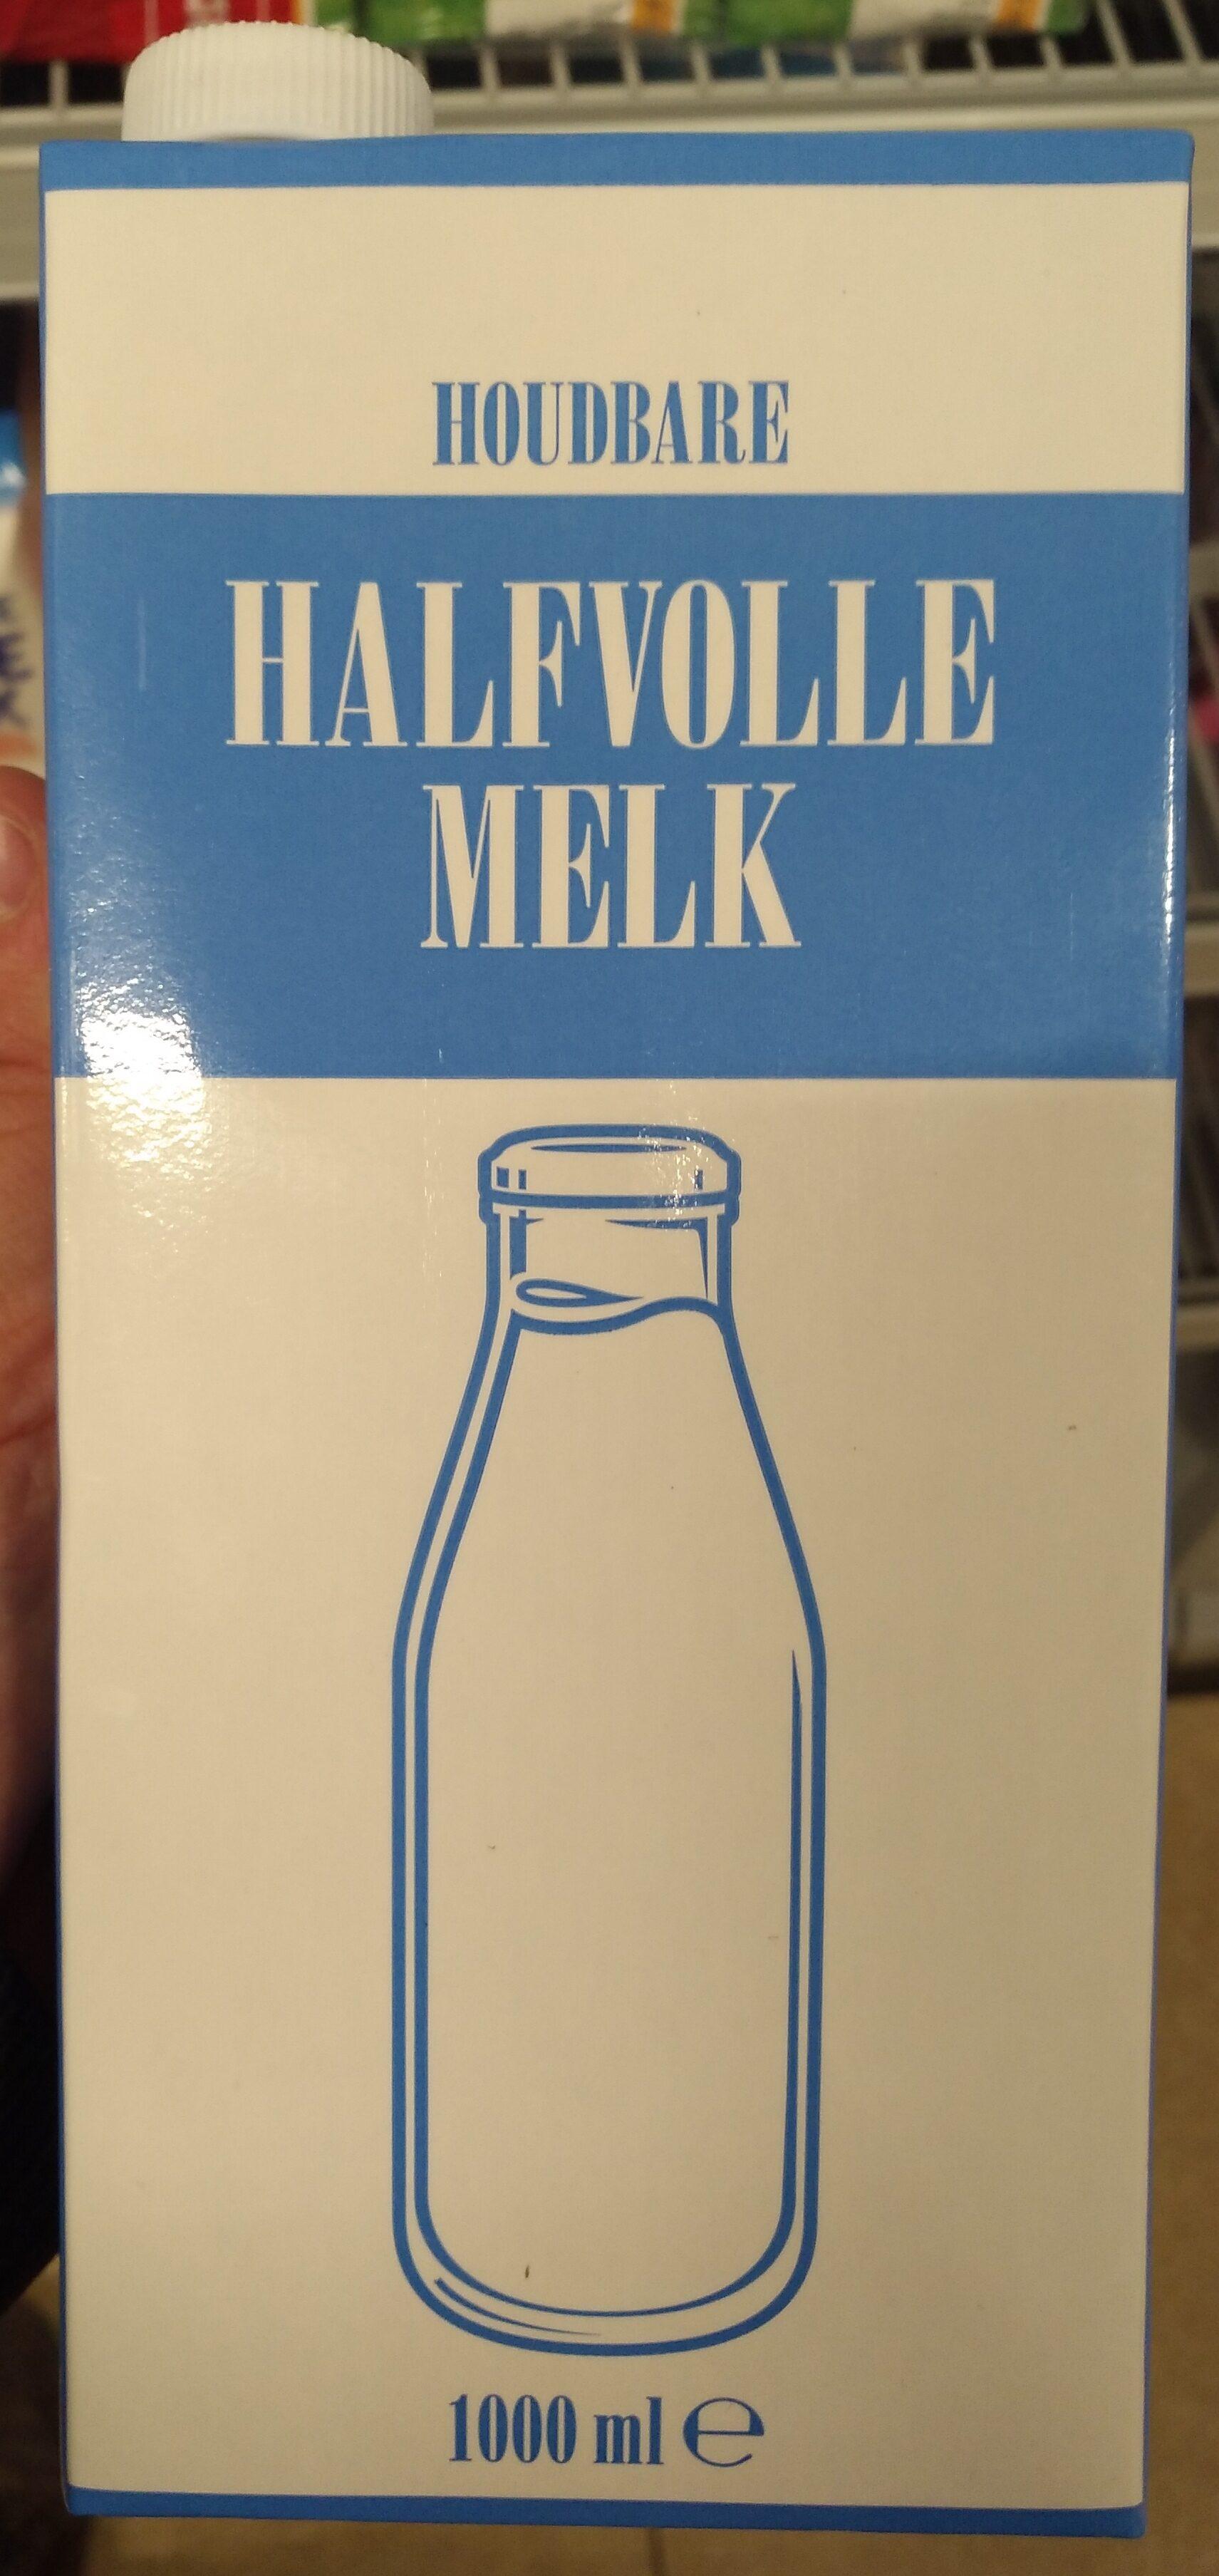 Houdbare halfvolle melk - Product - nl